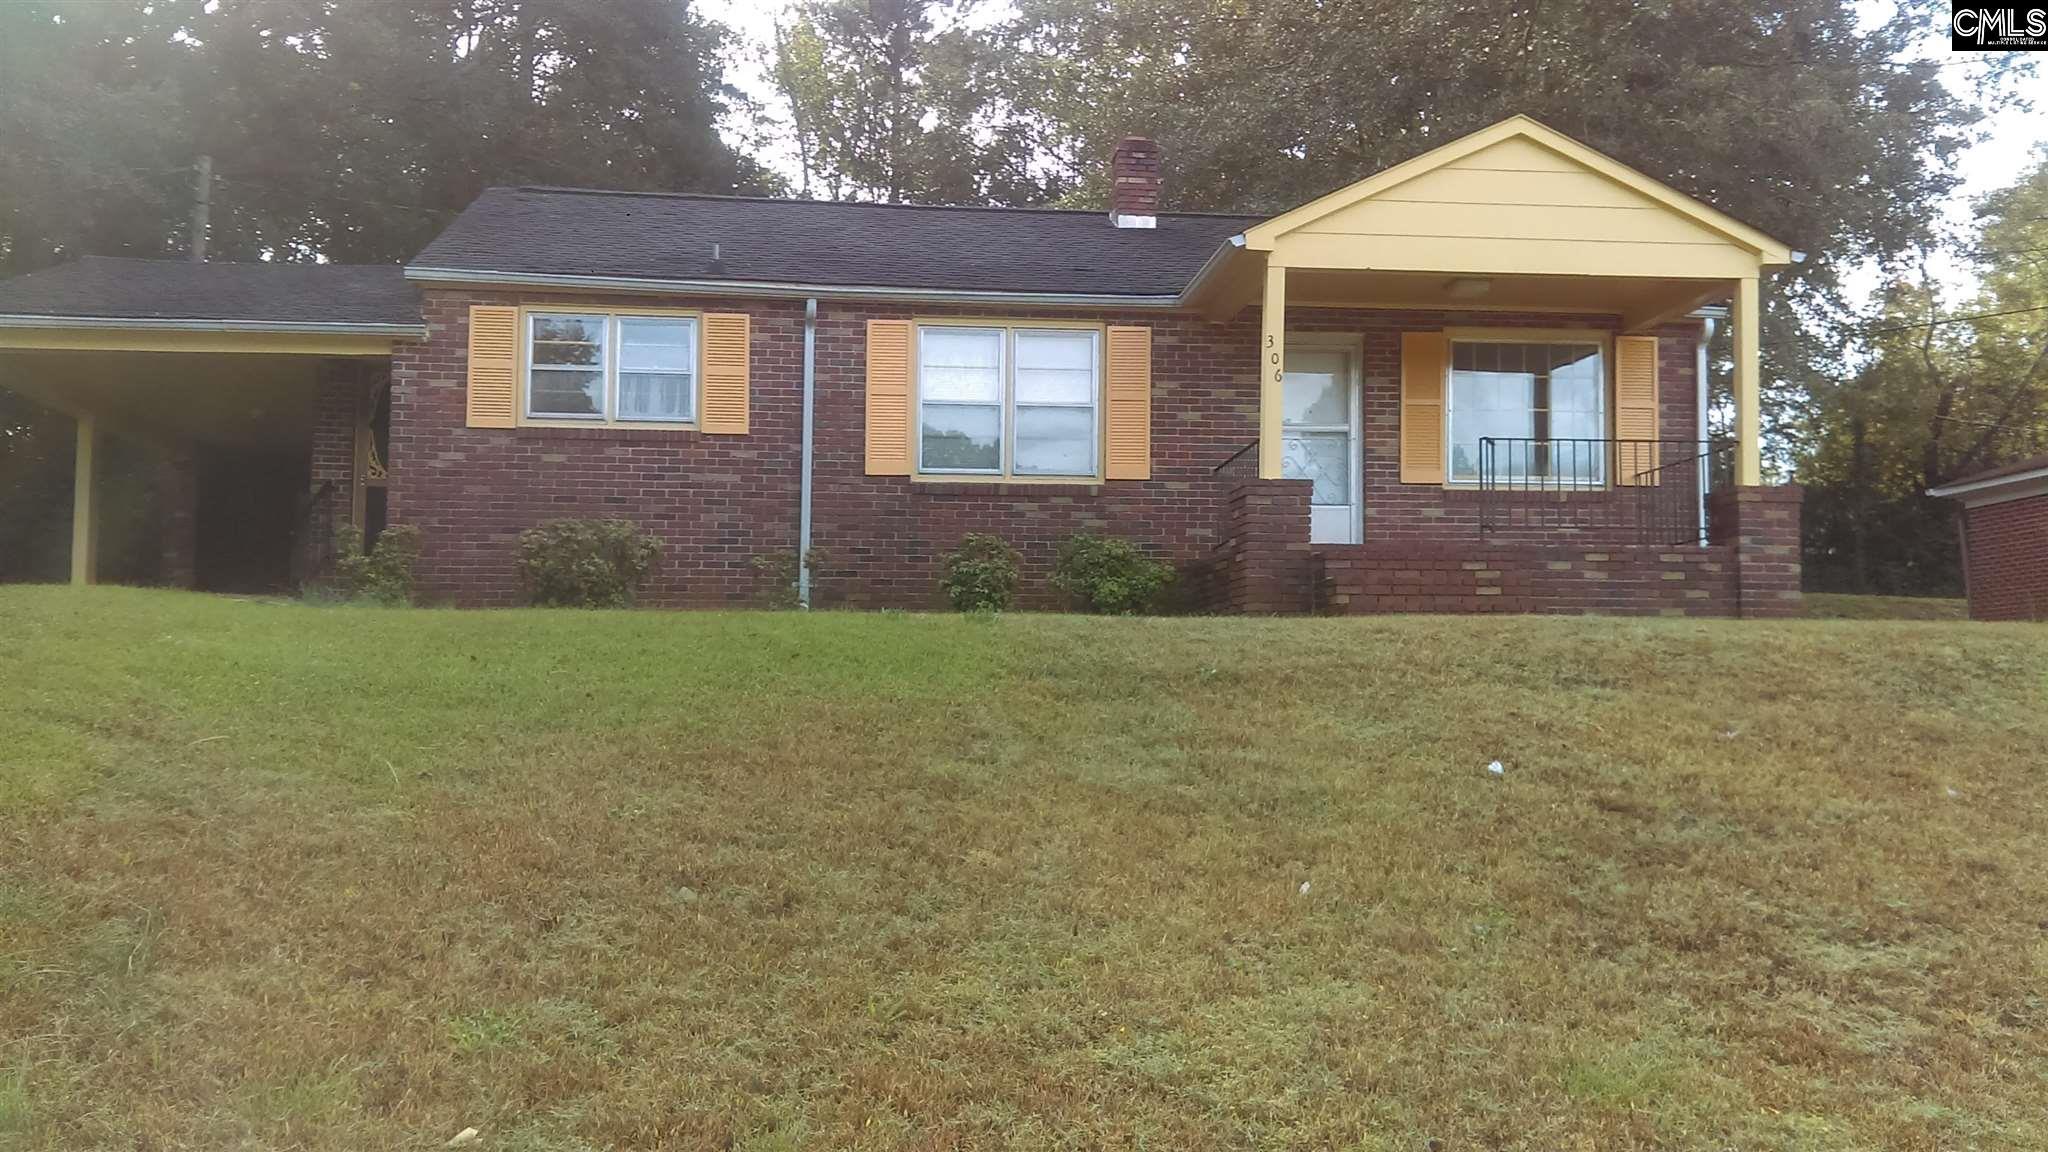 306 N Roosevelt Winnsboro, SC 29180